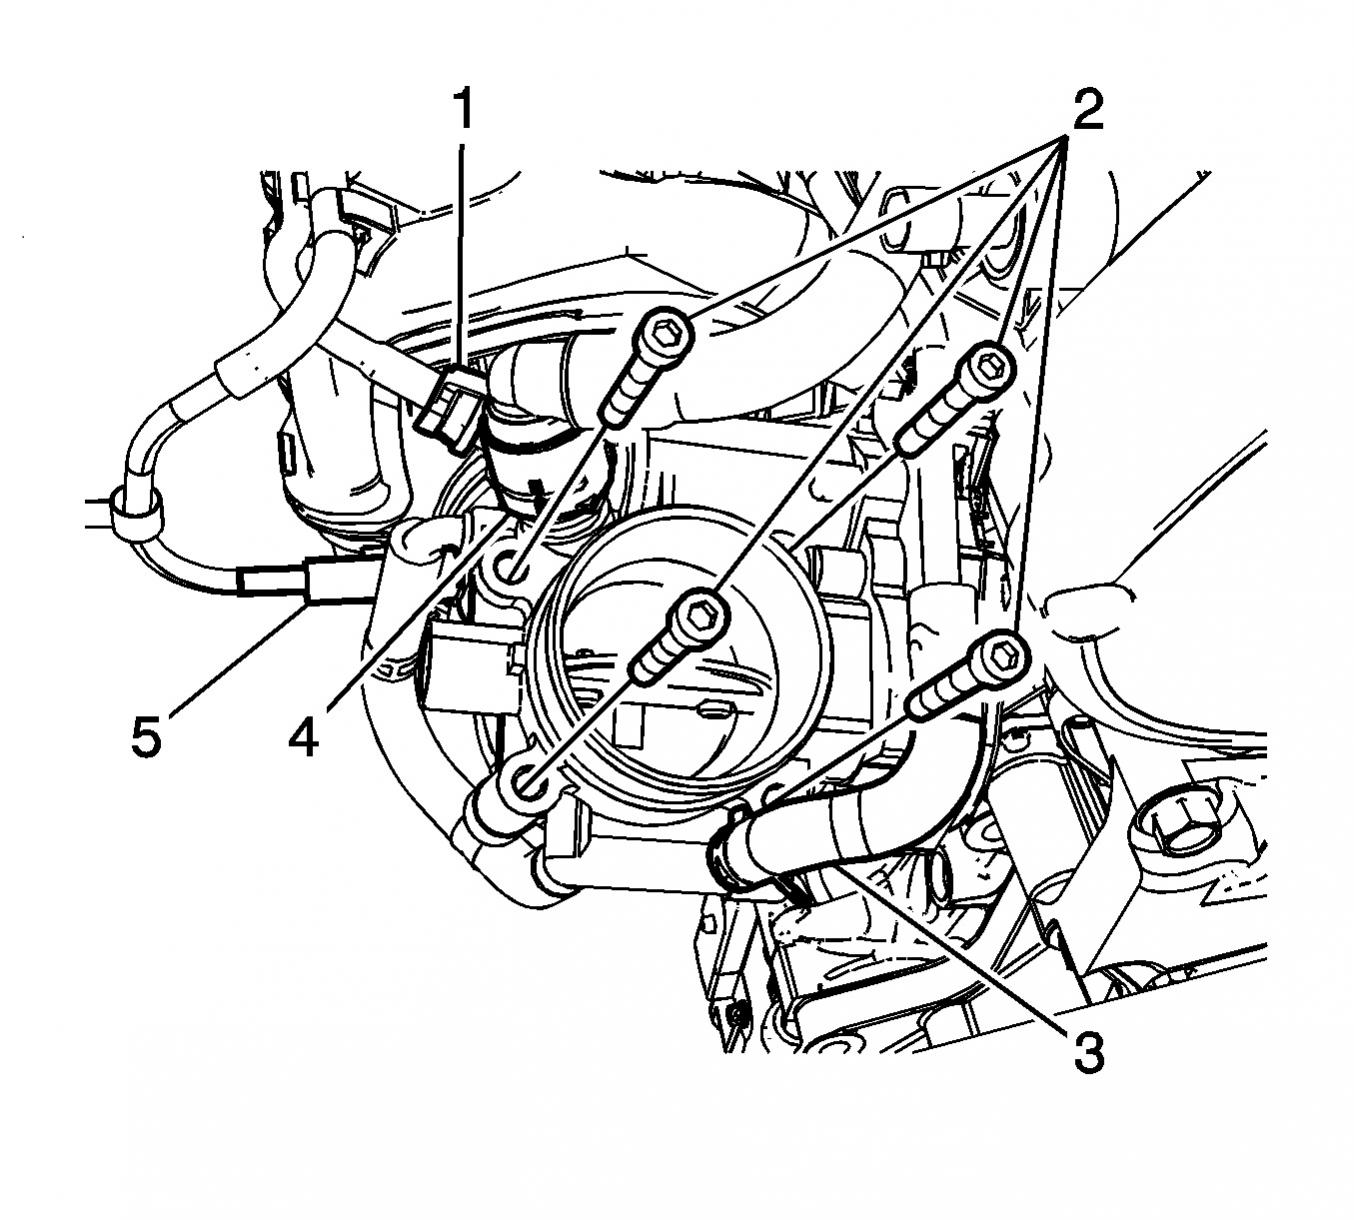 2009 aveo5 pcv valve location smart car chevy aveo intake schematic